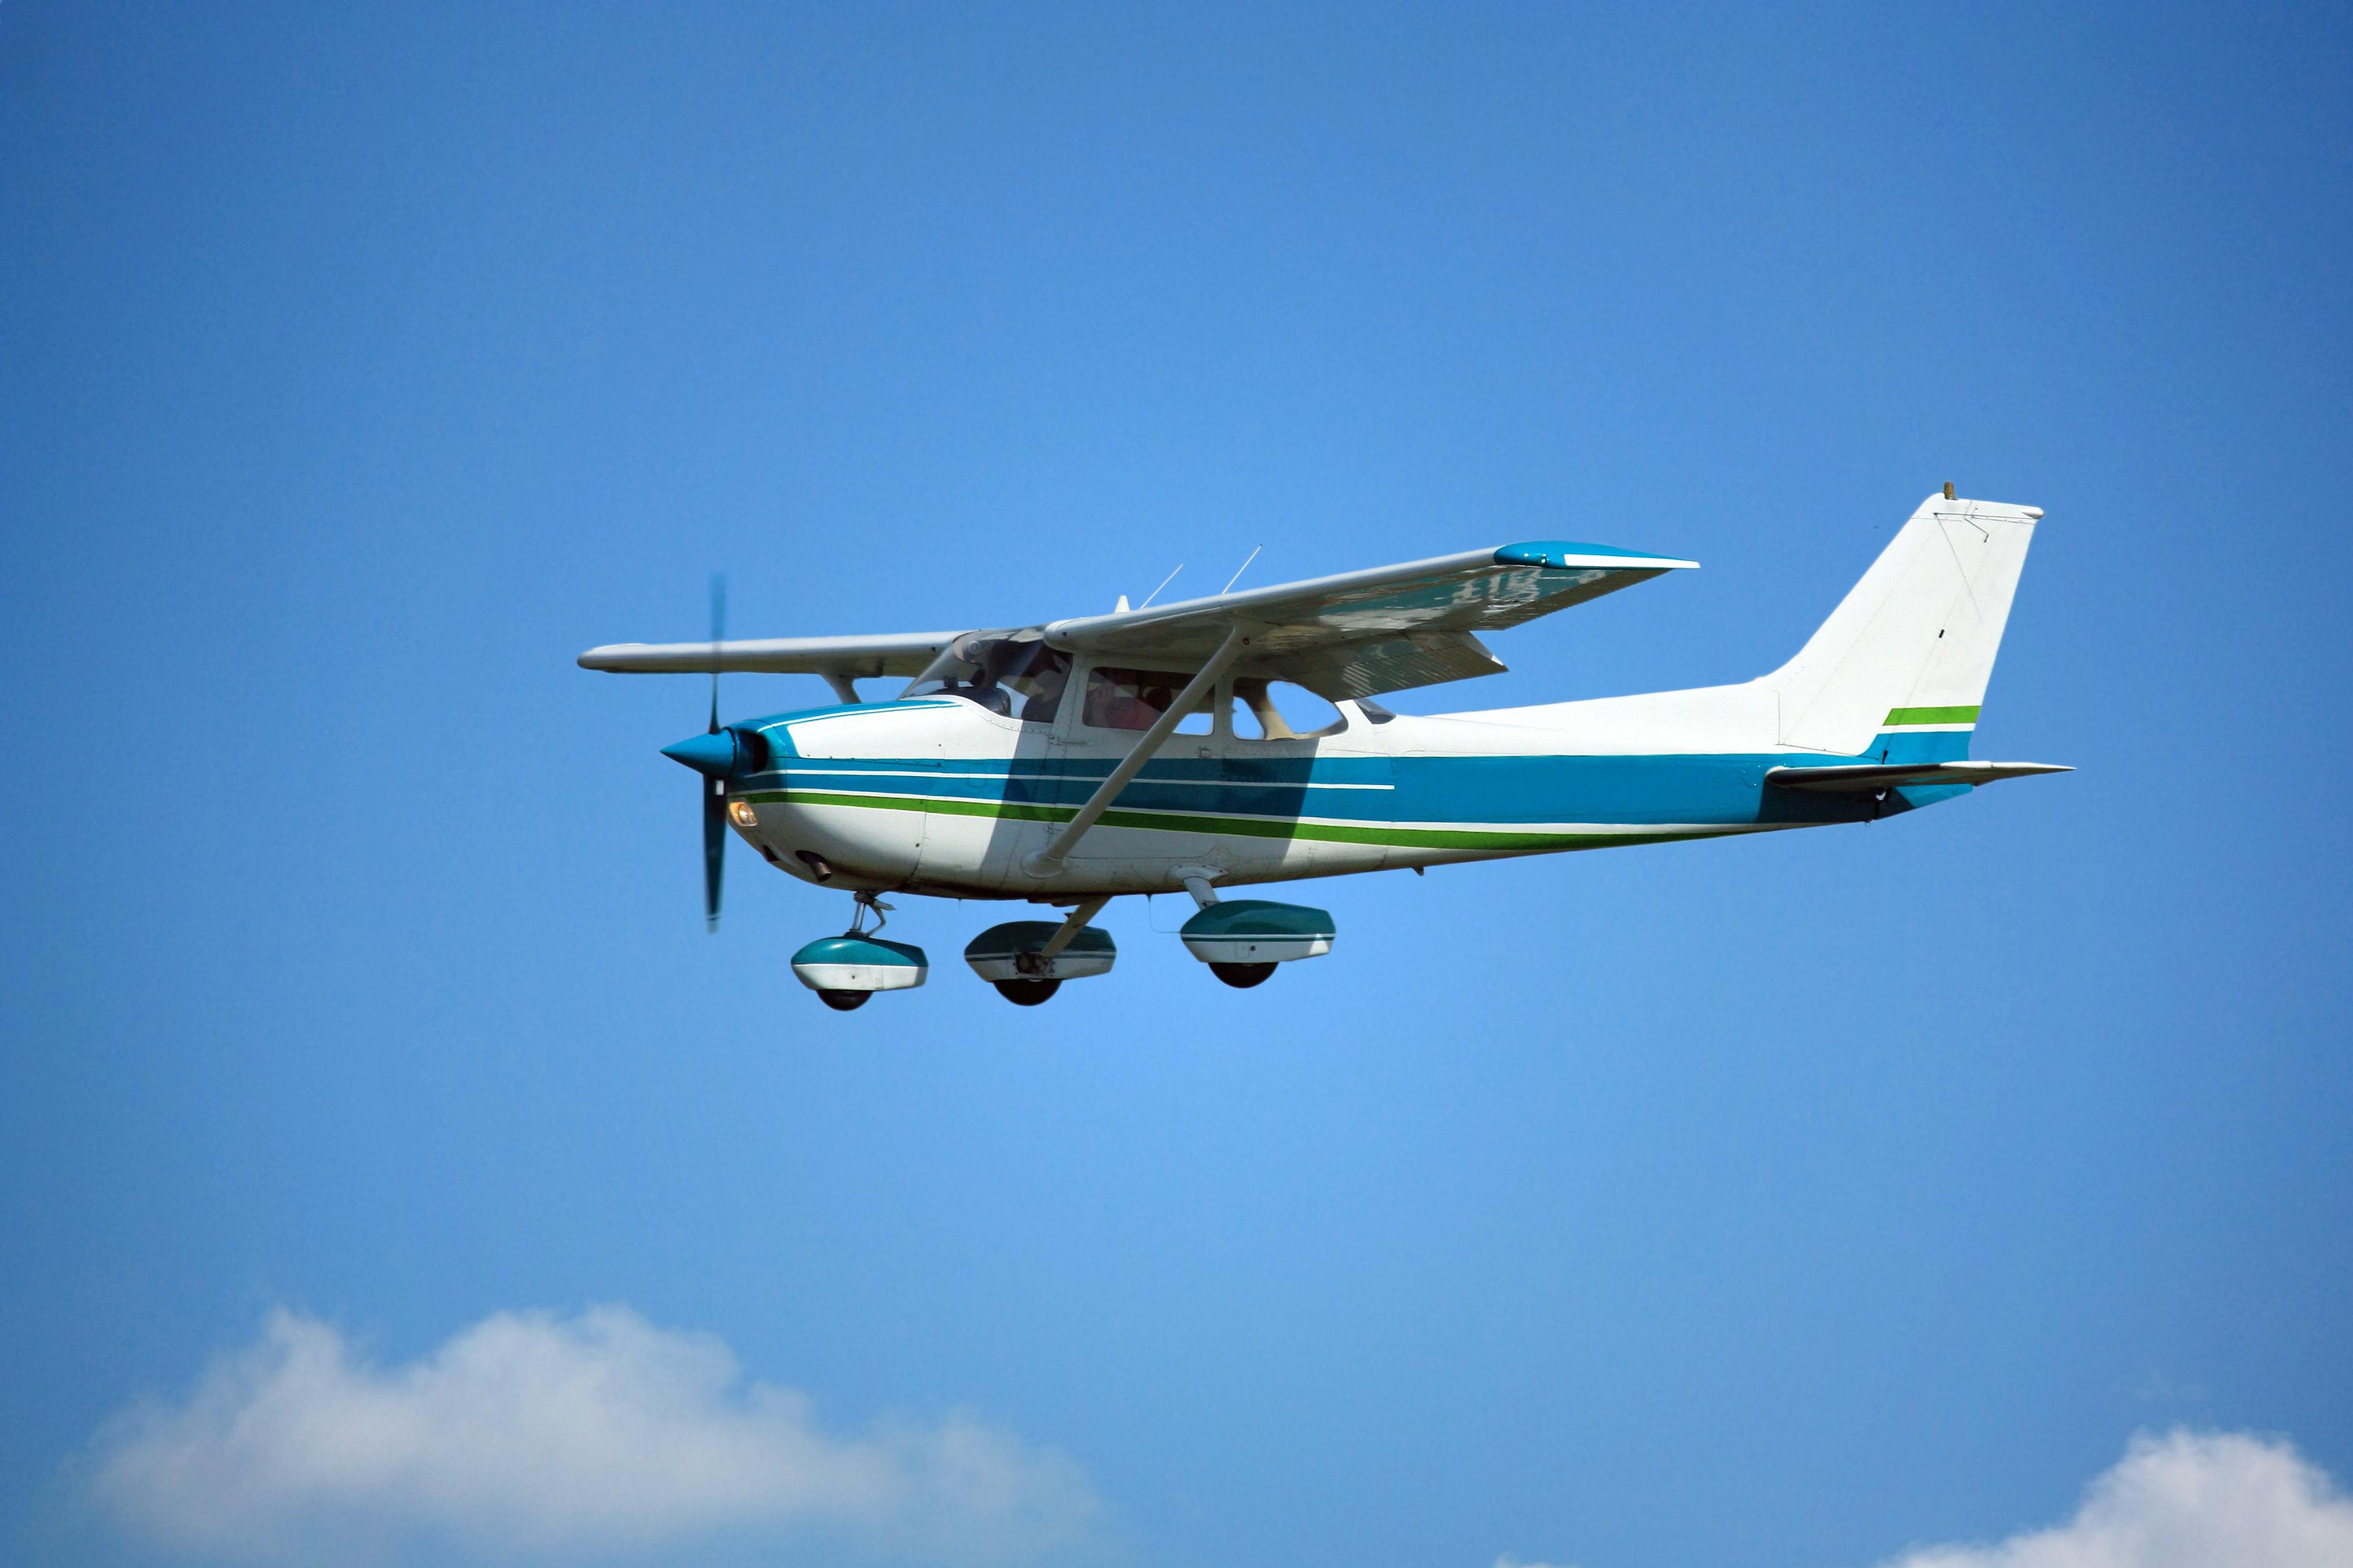 General Aviation